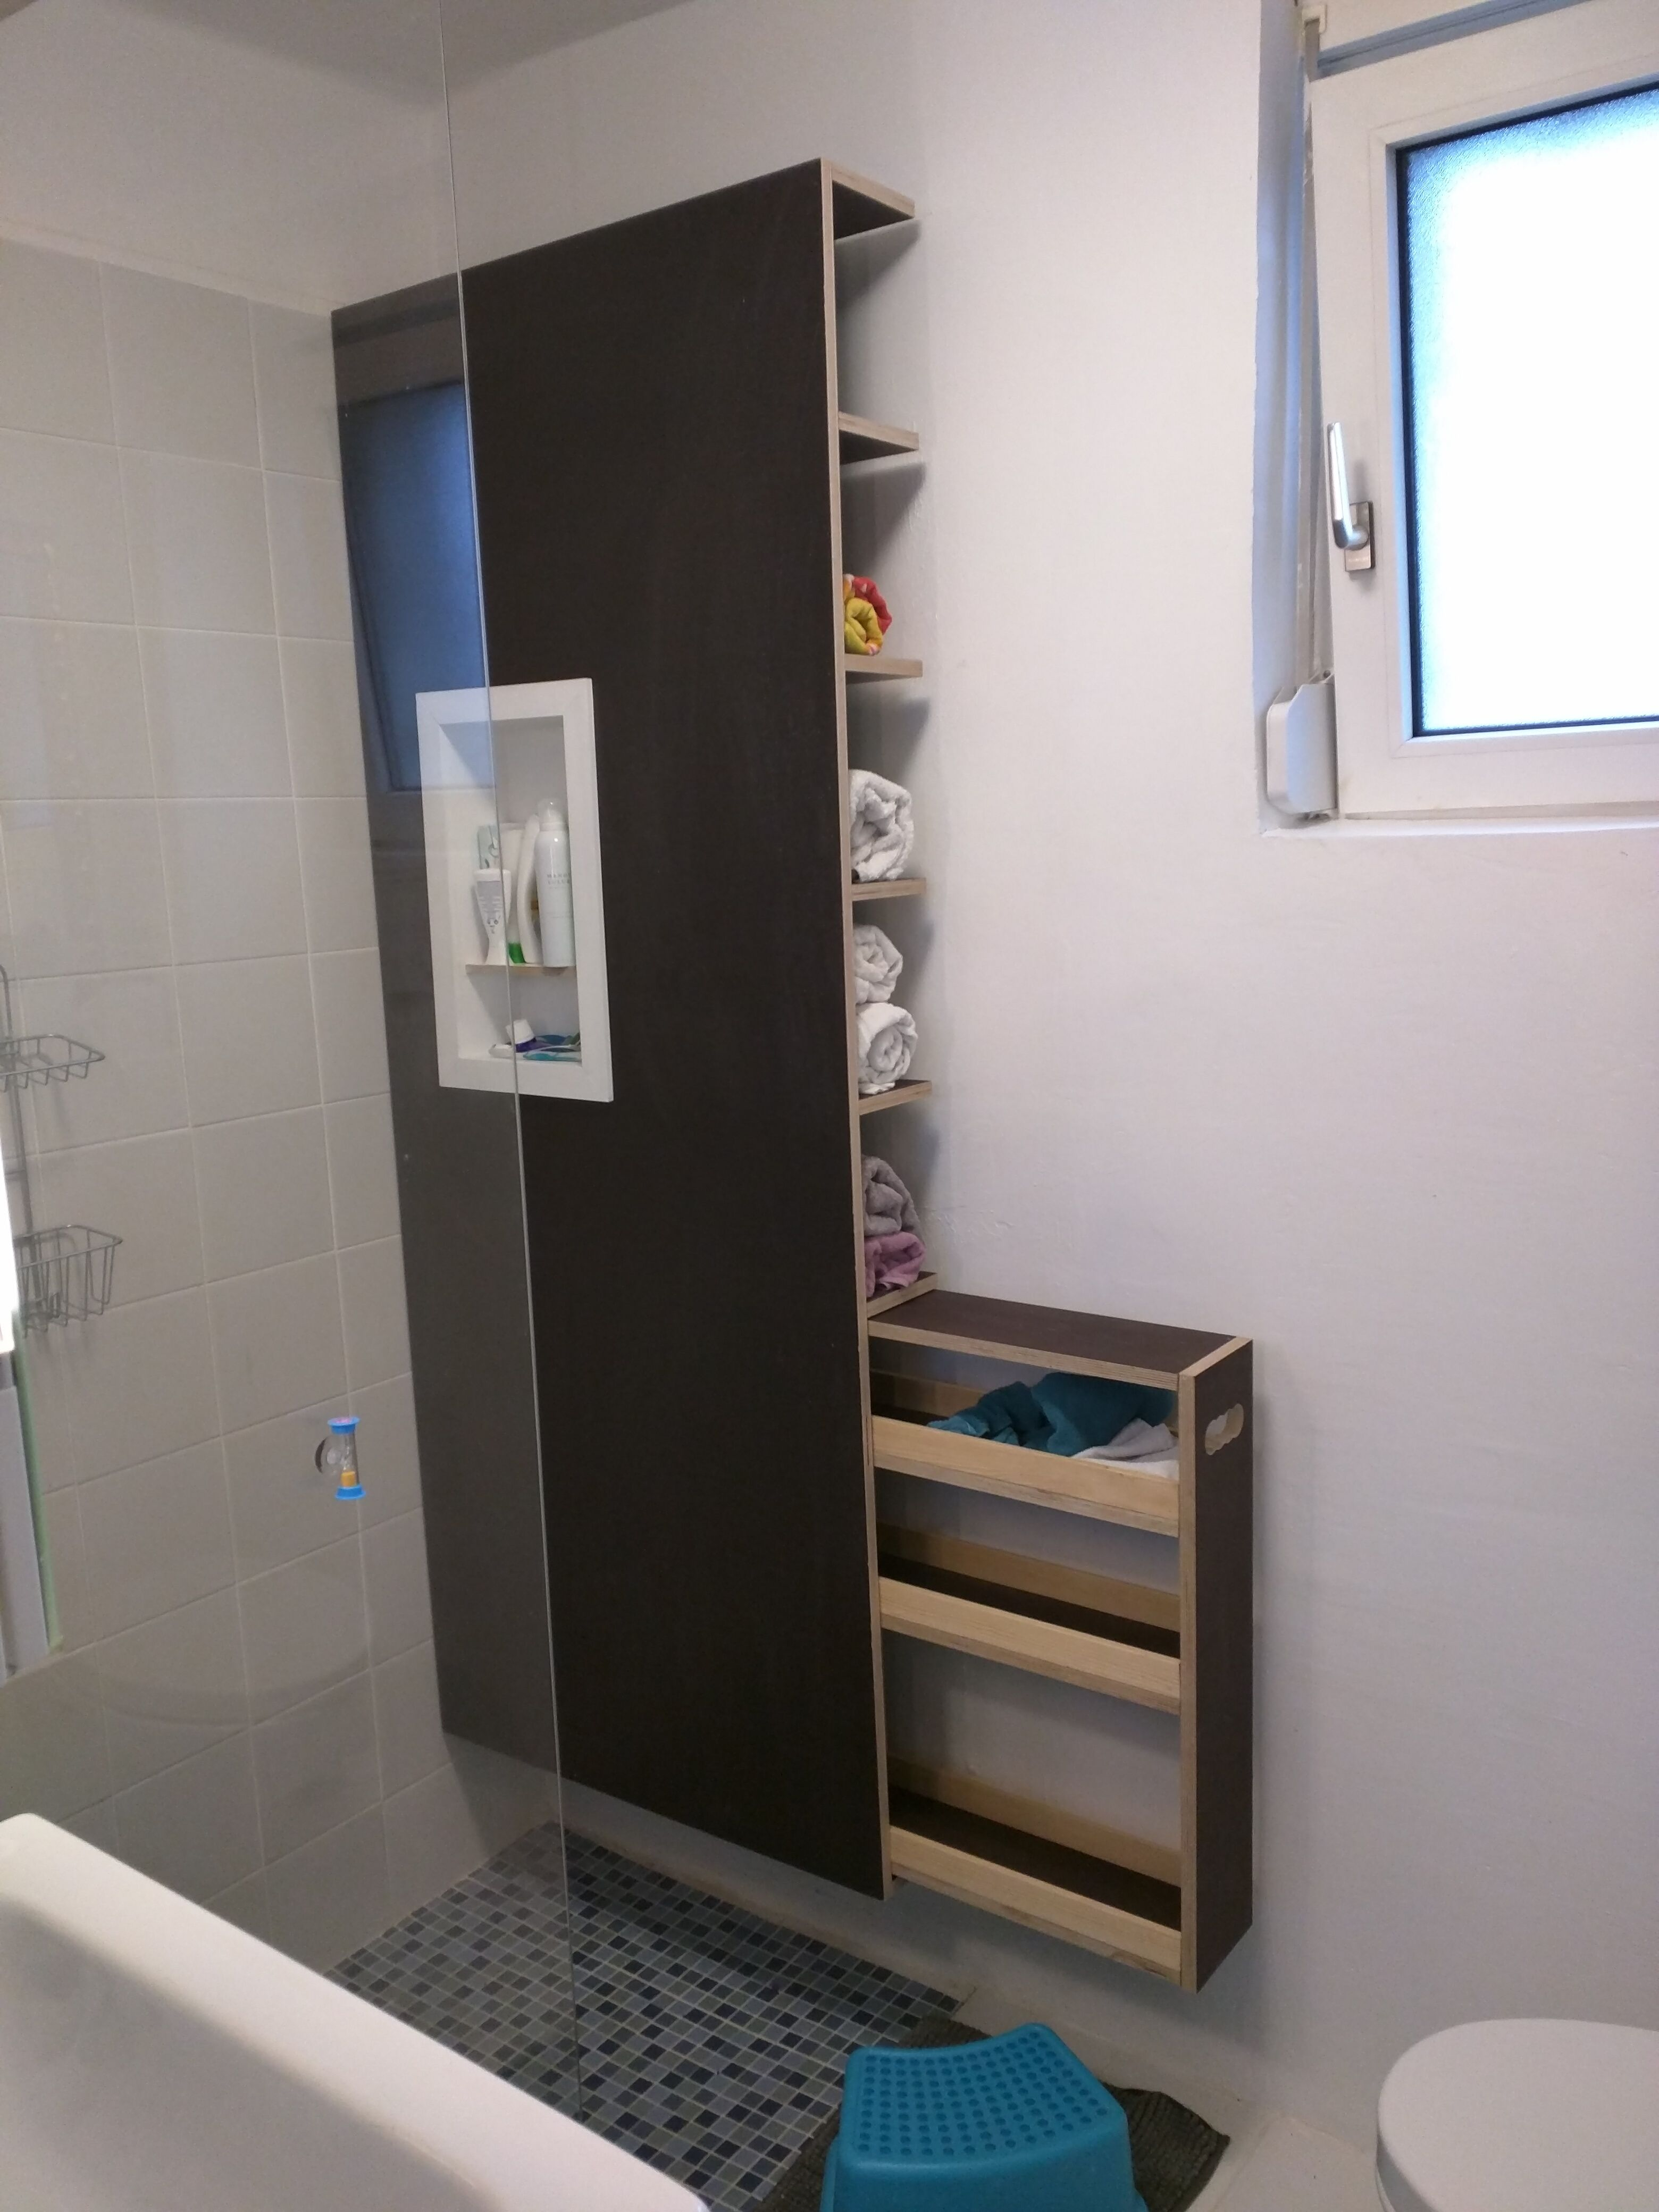 falttür dusche u-form ab 70 x 70 x 220 cm echtglas esg klar hell 6, Badezimmer